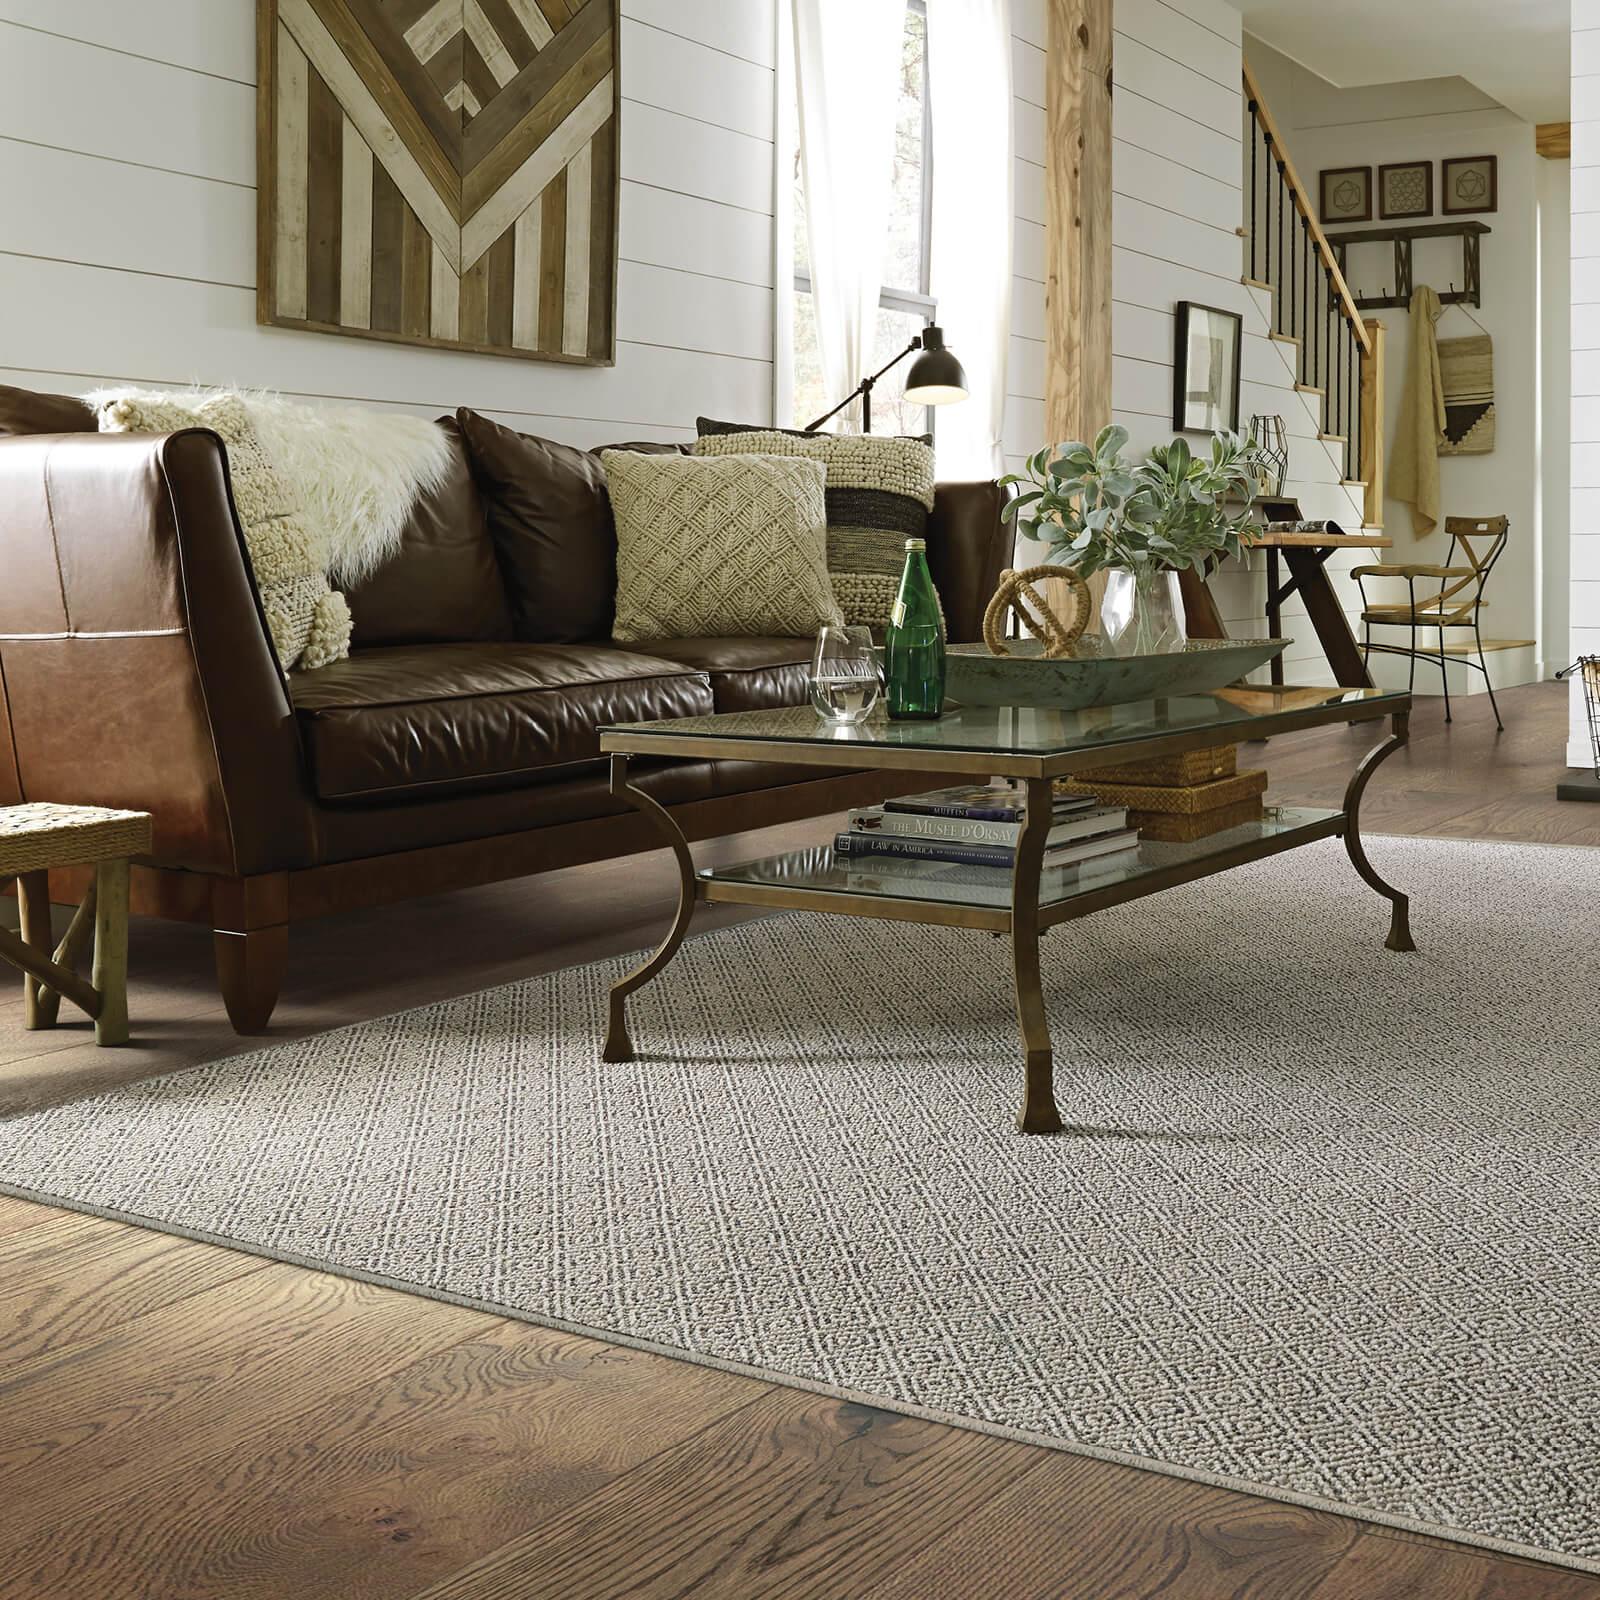 Sofa and coffee table on floor | Kirkland's Flooring